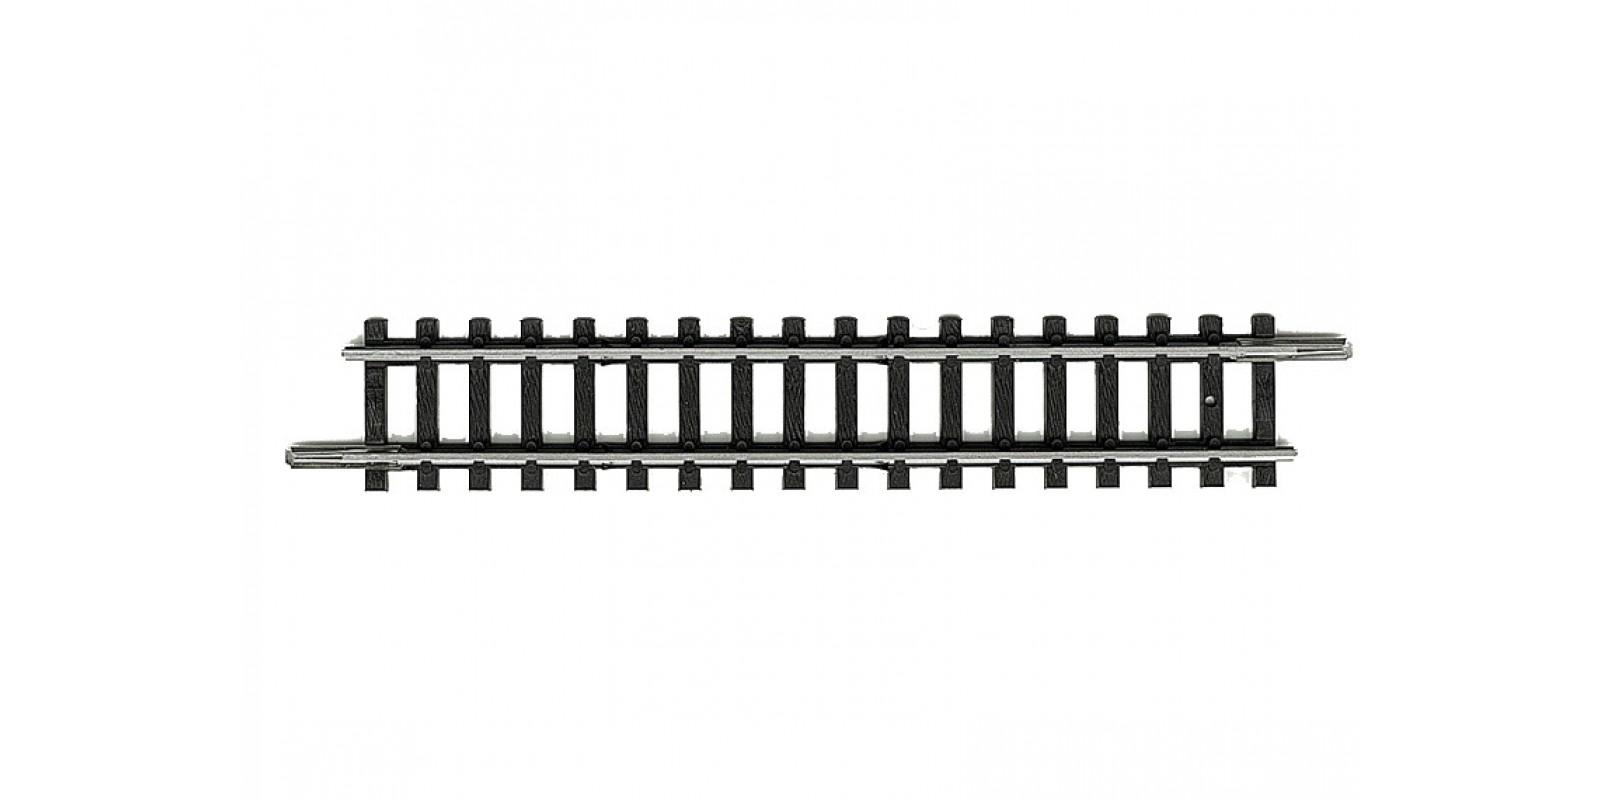 T14905 - Straight Track